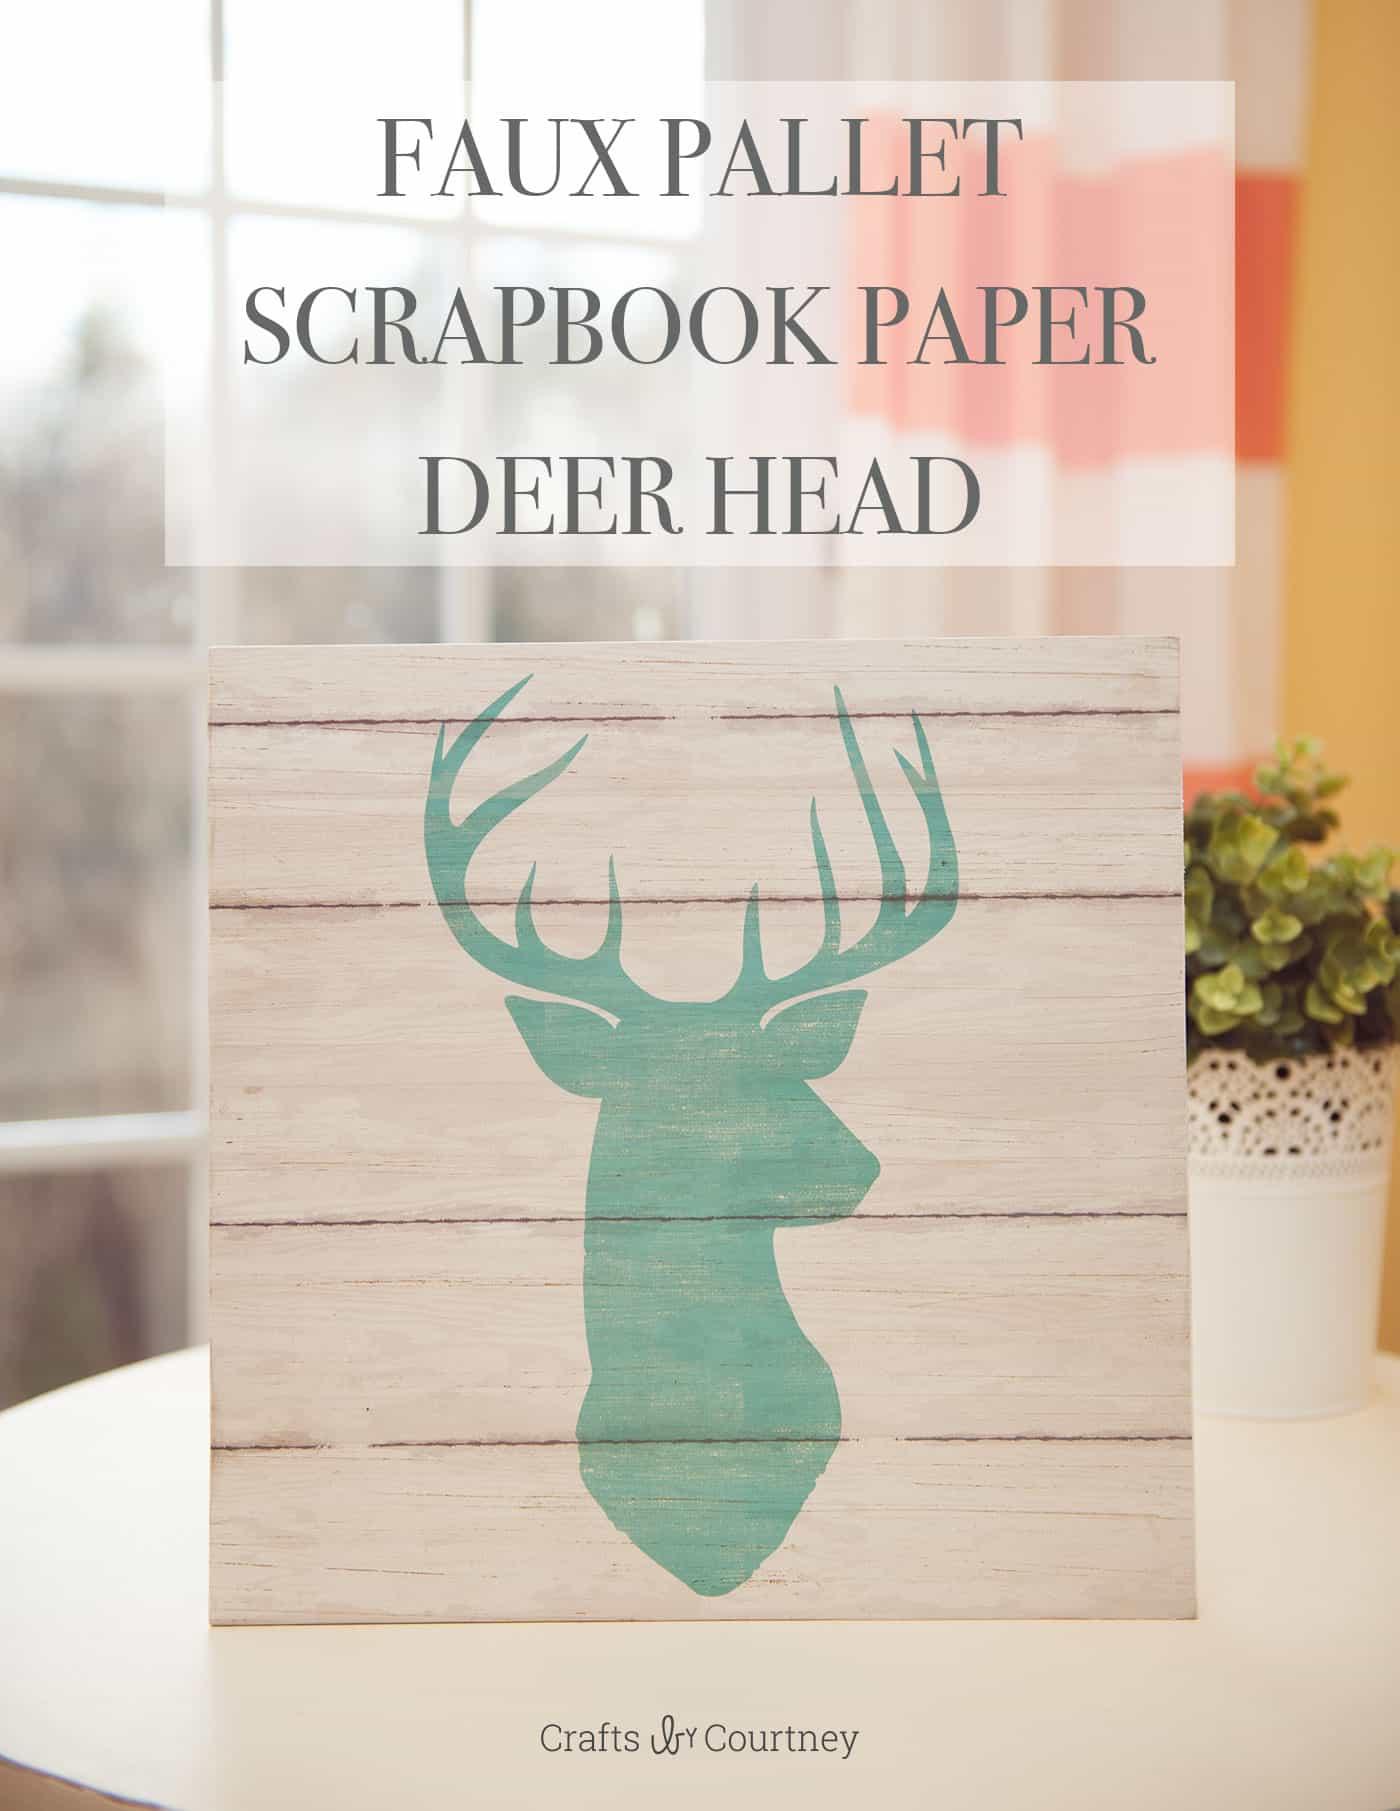 Diy Wall Art With Scrapbook Paper : Easy diy wall art with scrapbook paper mod podge rocks